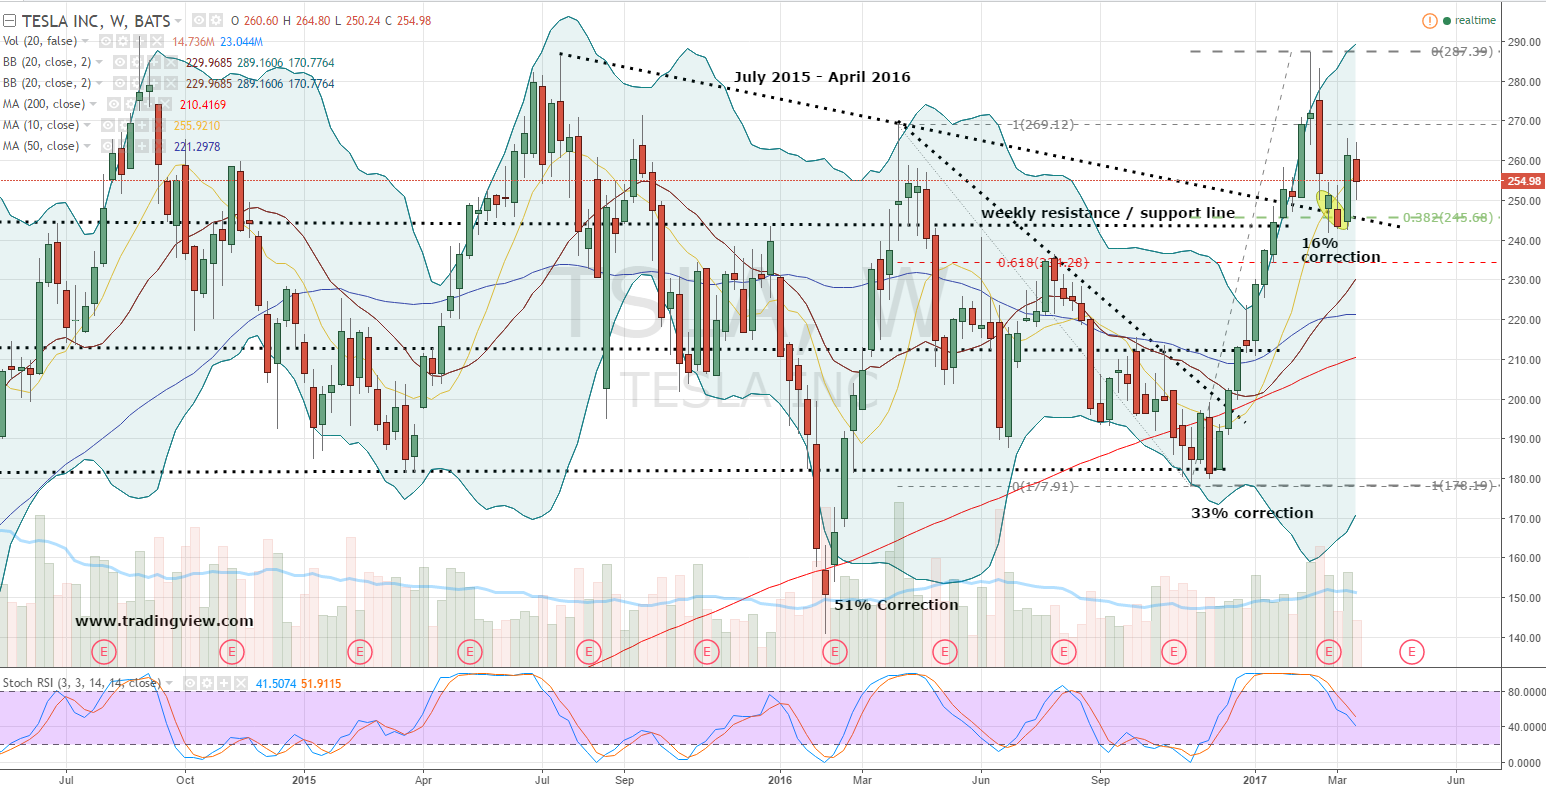 Tesla Inc (TSLA) Stock Rating Reaffirmed by Morgan Stanley